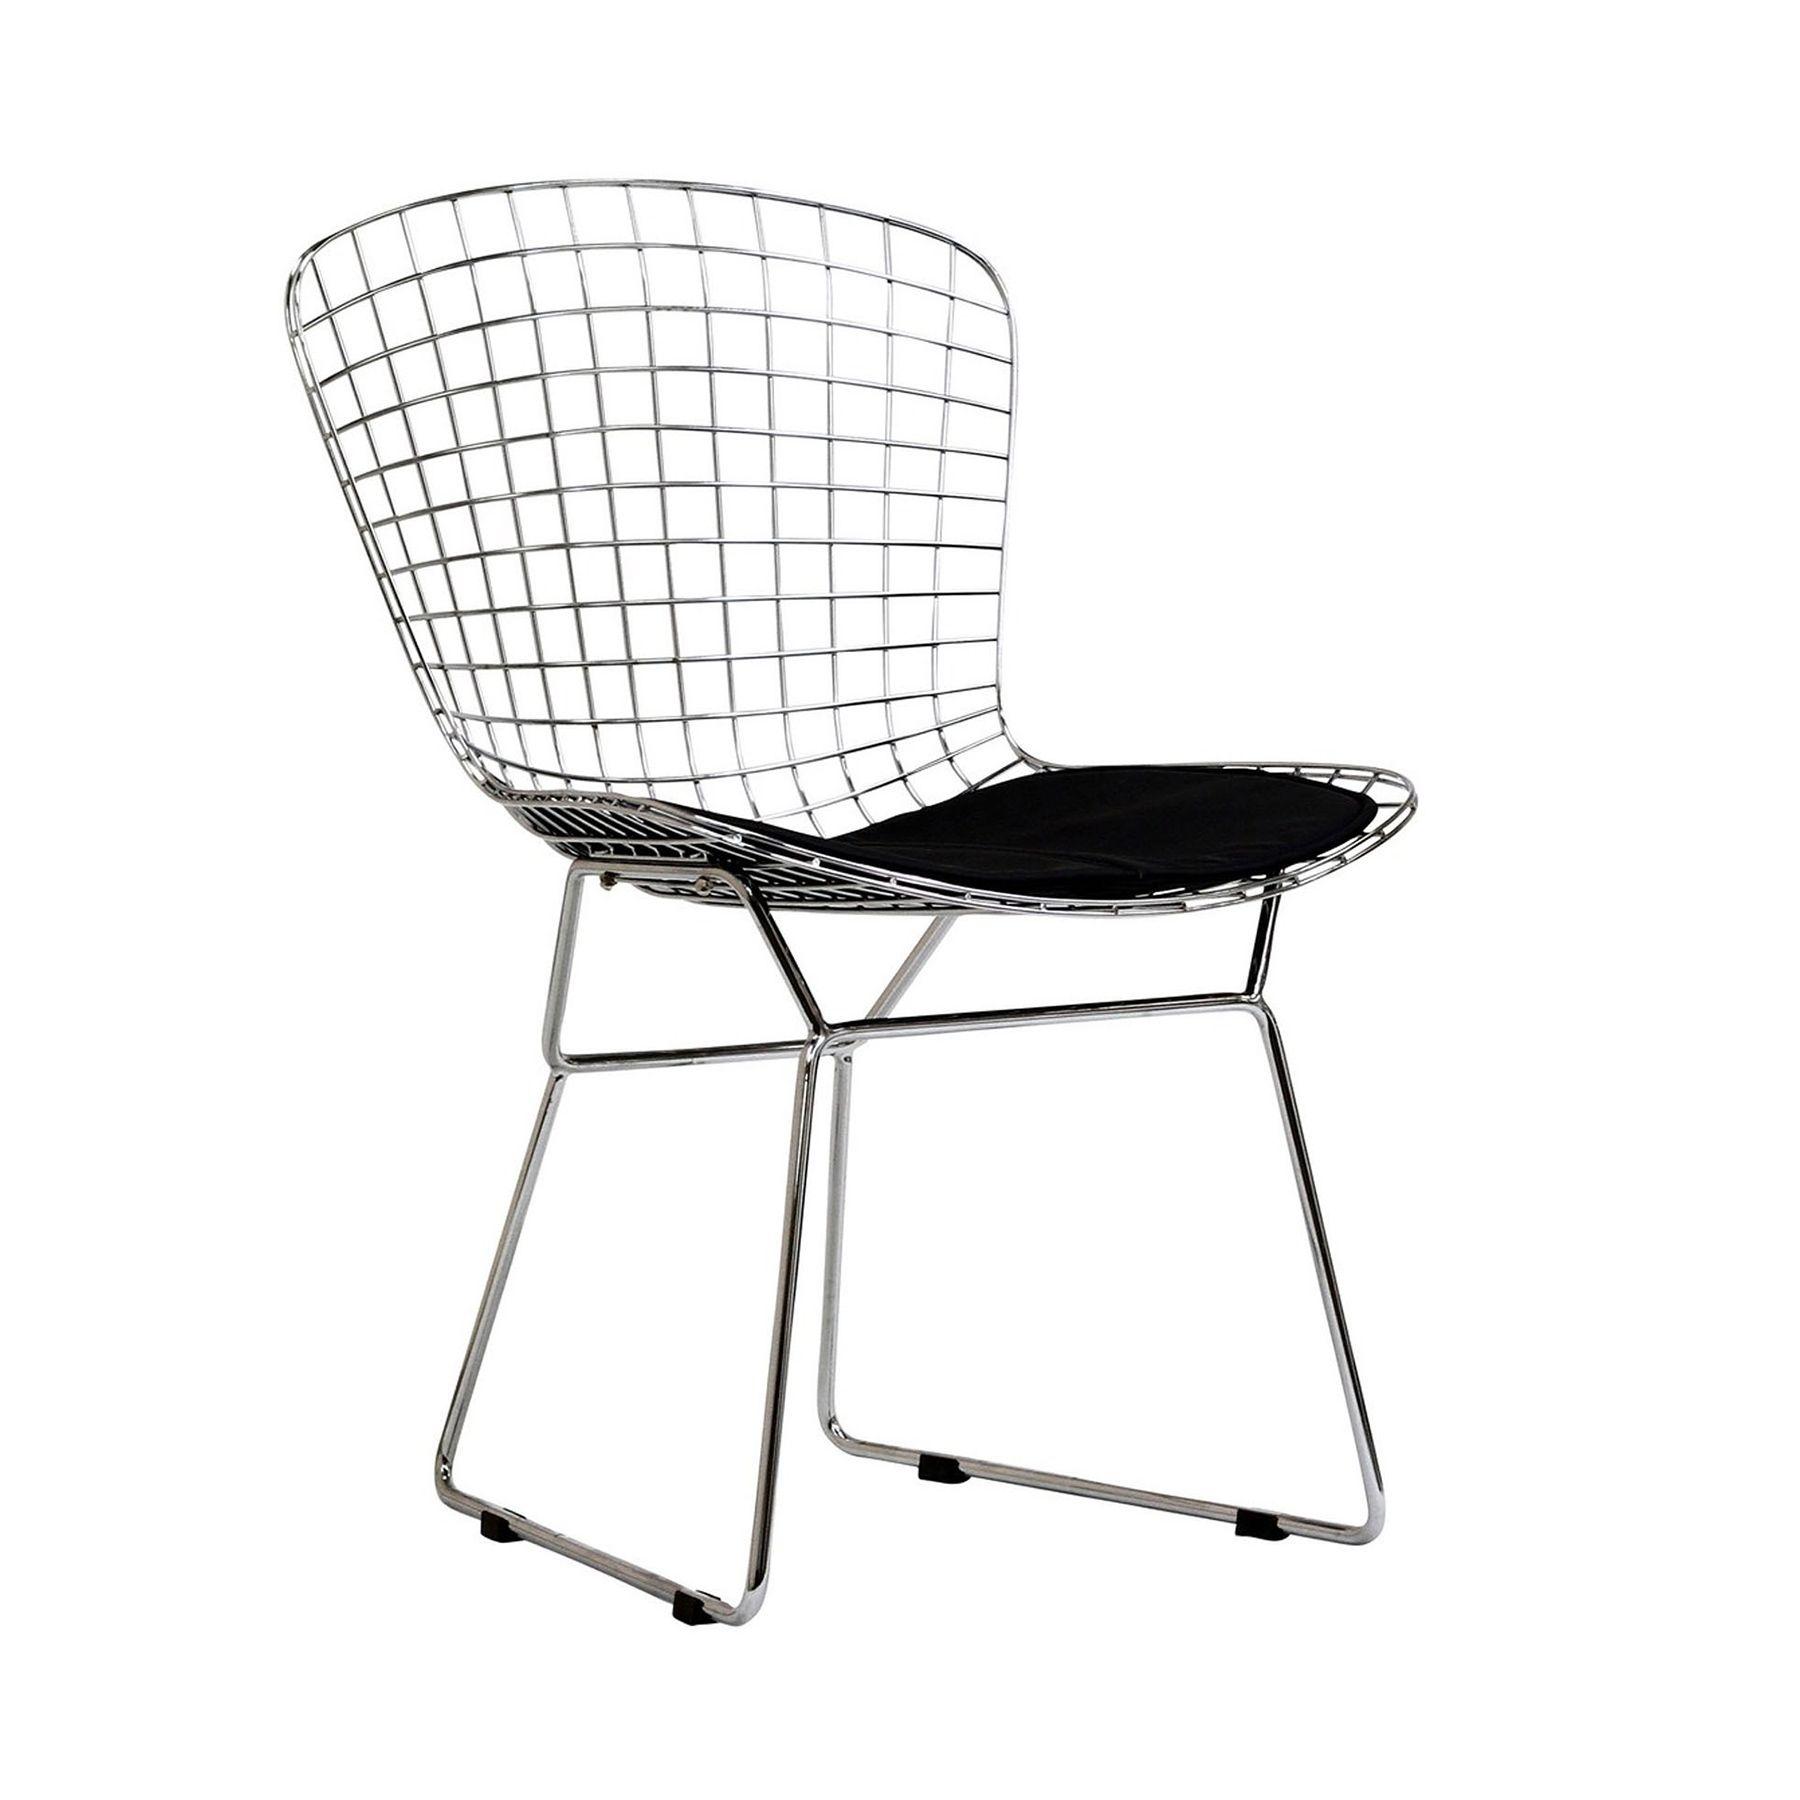 Bertoia diamond chair dimensions - Design Icons The Diamond Chair